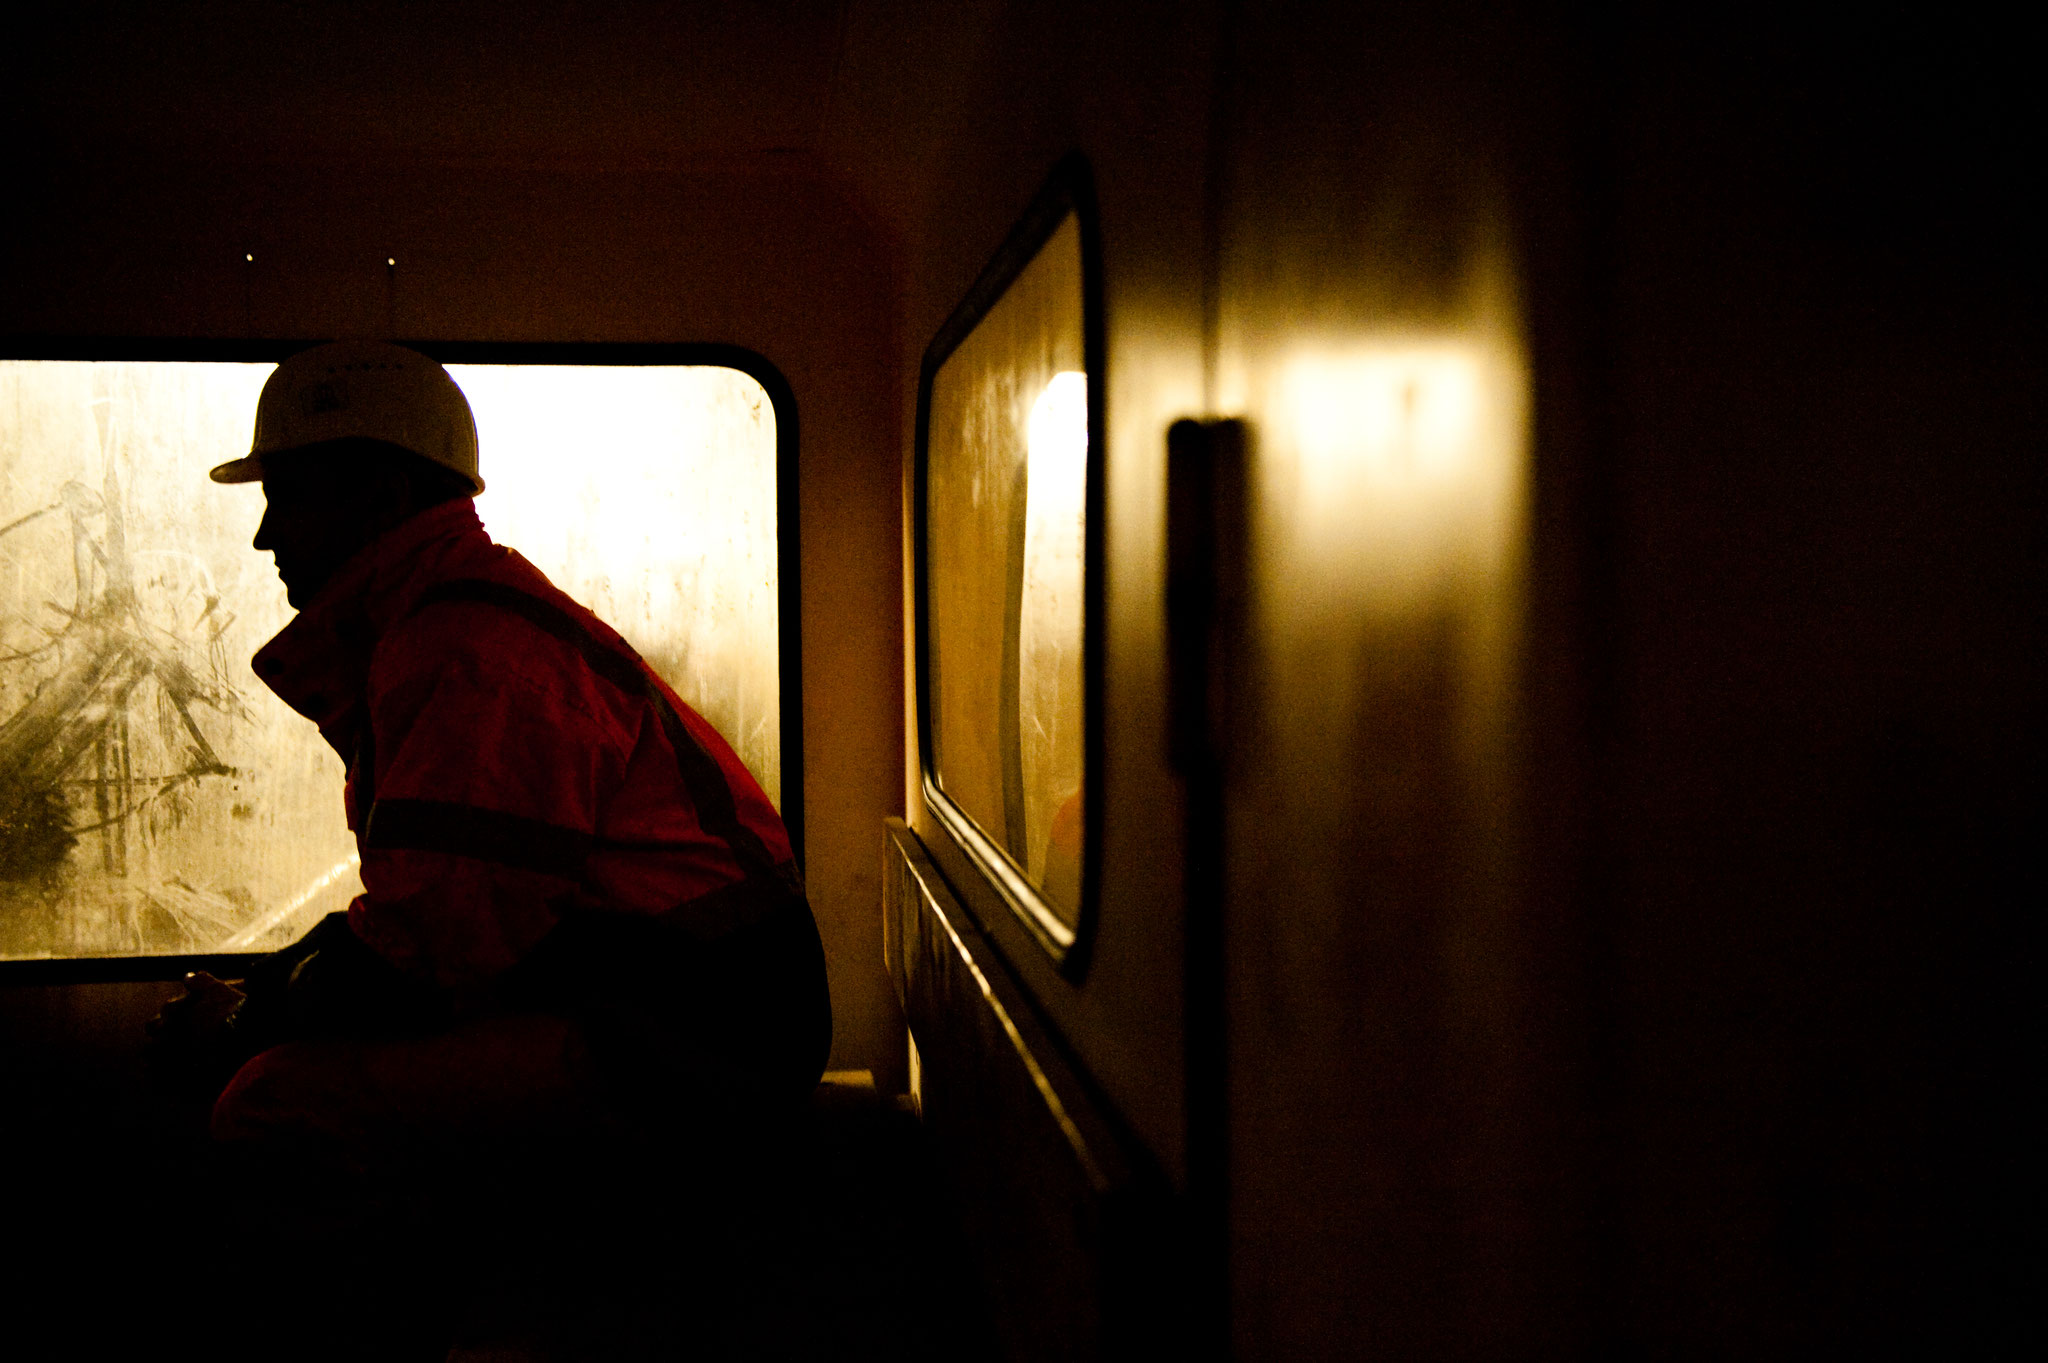 Fahrt in den Finnetunnel - fotografiert für PORR - © Dirk Brzoska